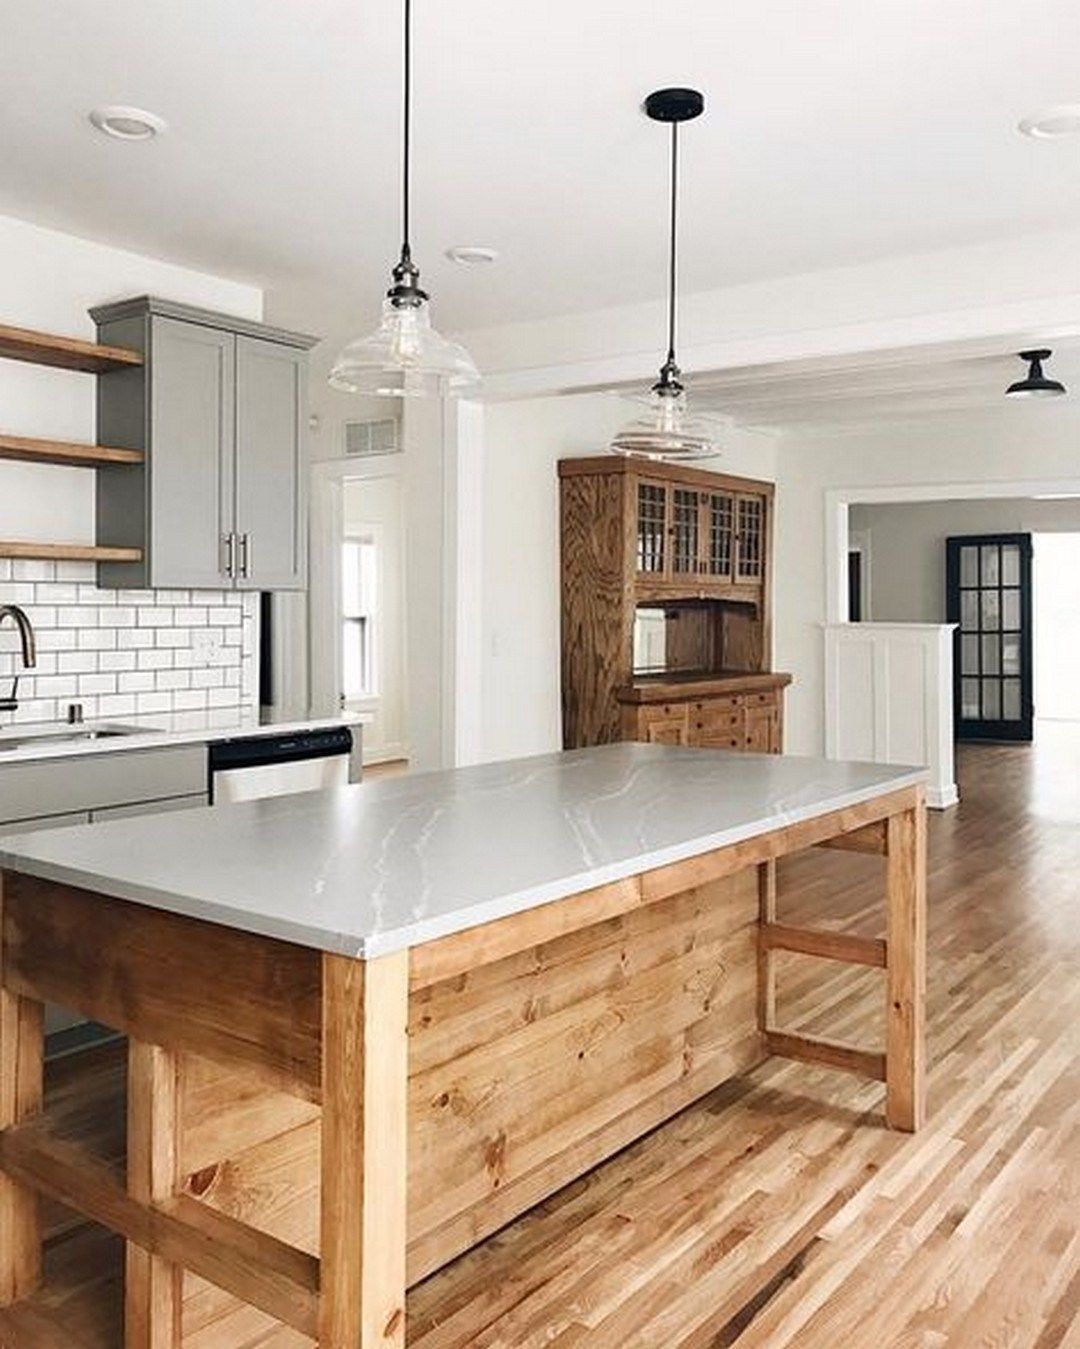 Best 16 Beautiful Kitchen Decorating Ideas On A Budget 5 400 x 300